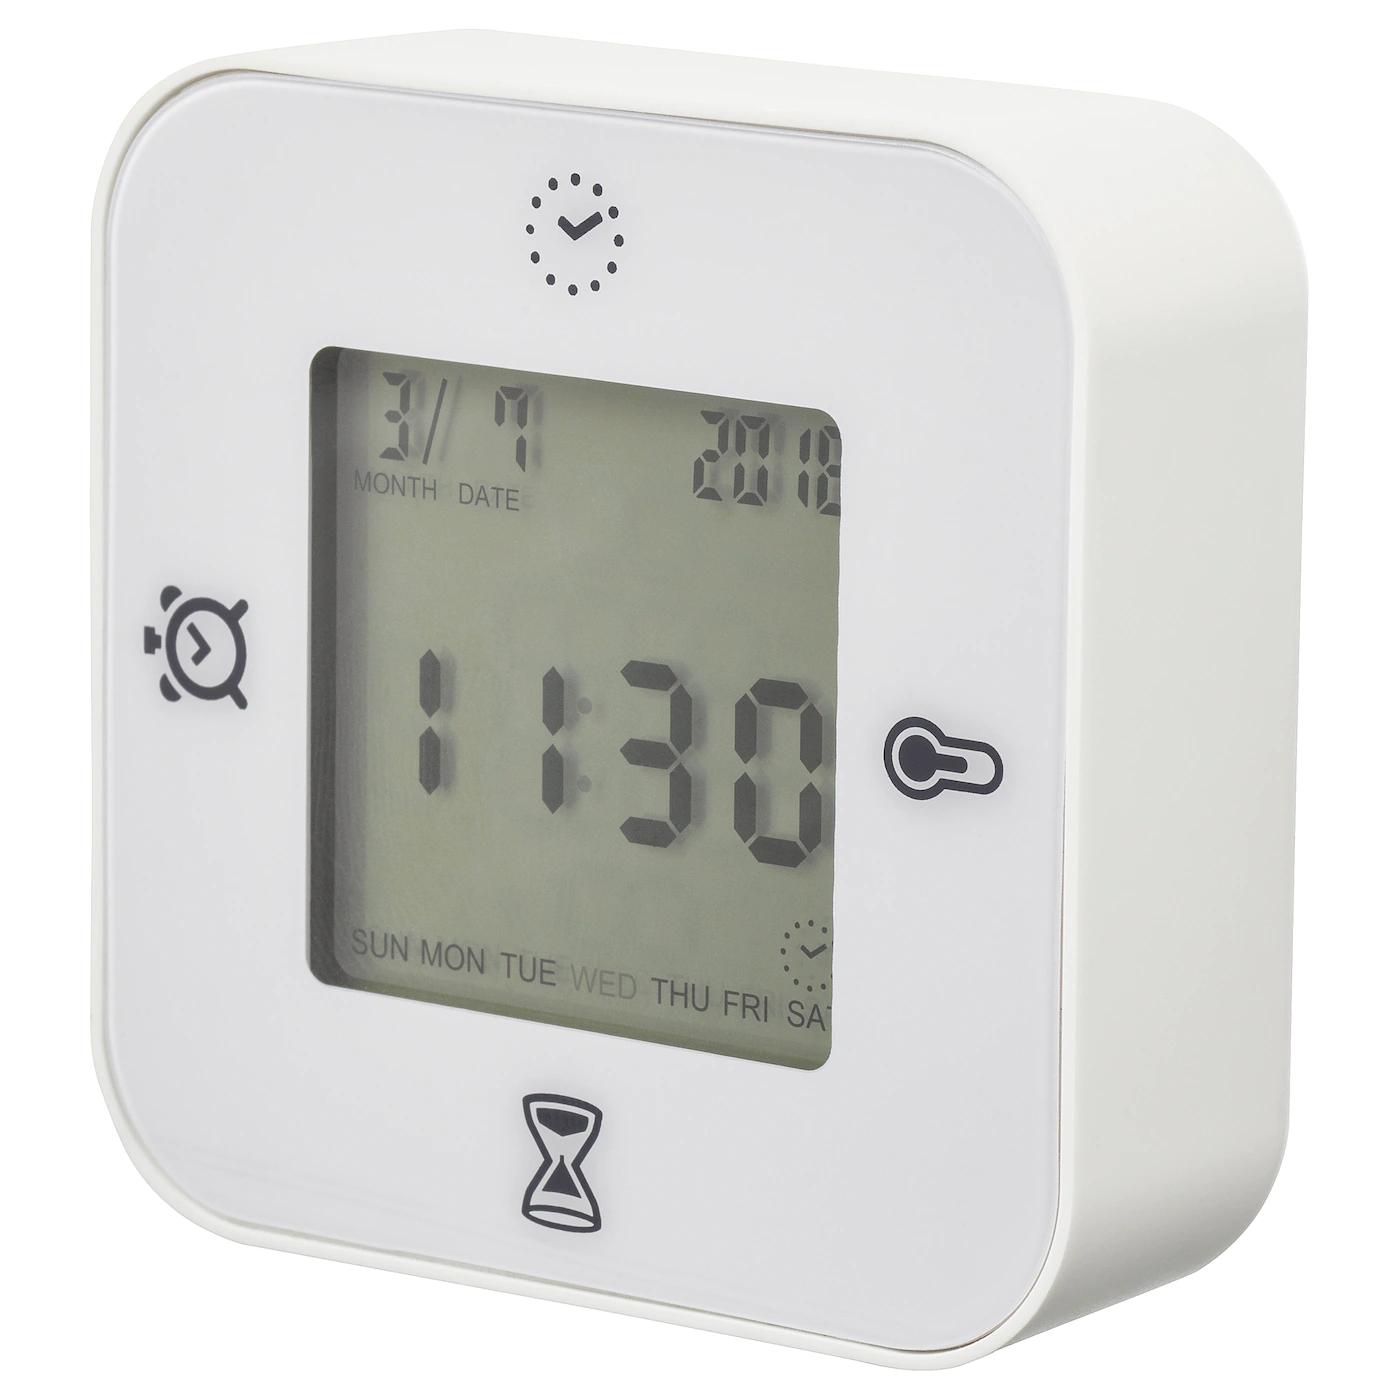 KLOCKIS Clock/thermometer/alarm/timer £3 instore @ Ikea